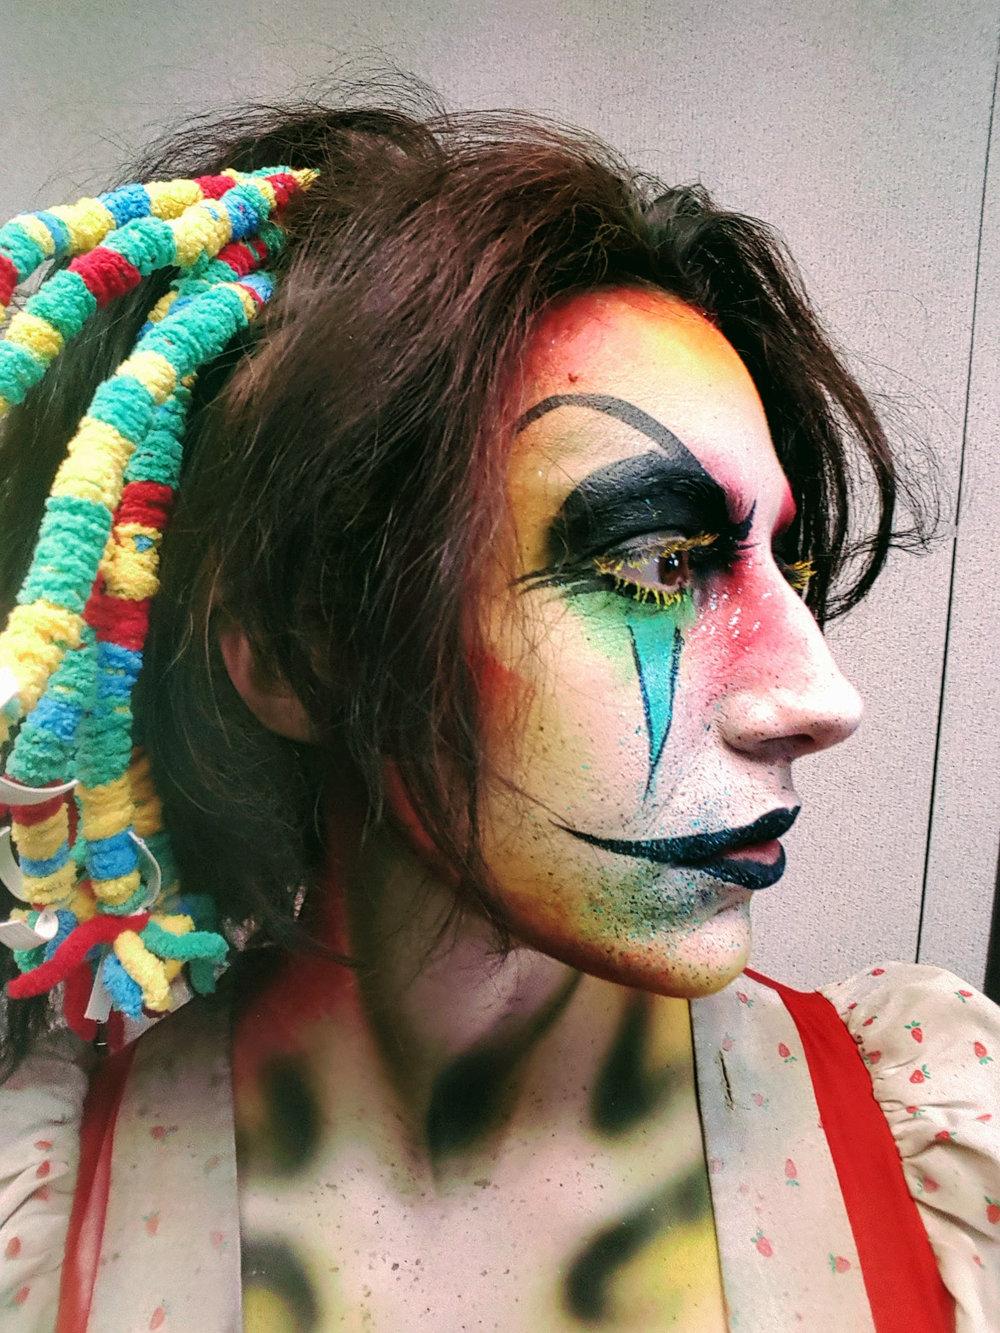 Adrienne_Whitney_Papp_Sinister_Circus_Midsummer_Scream_2017_Queen_Mary_Dark_Harbor_4.jpg